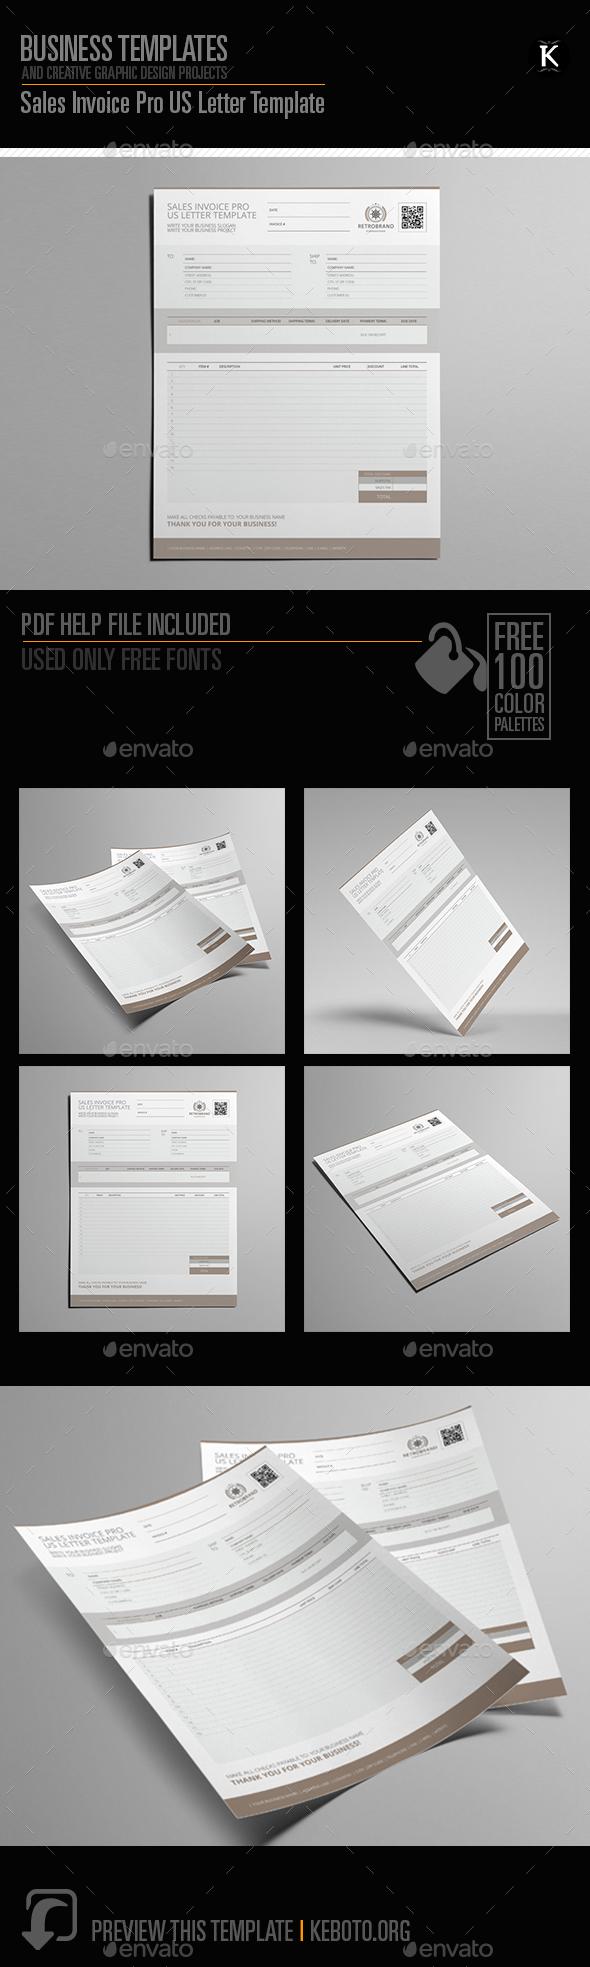 GraphicRiver Sales Invoice Pro US Letter Template 20659572